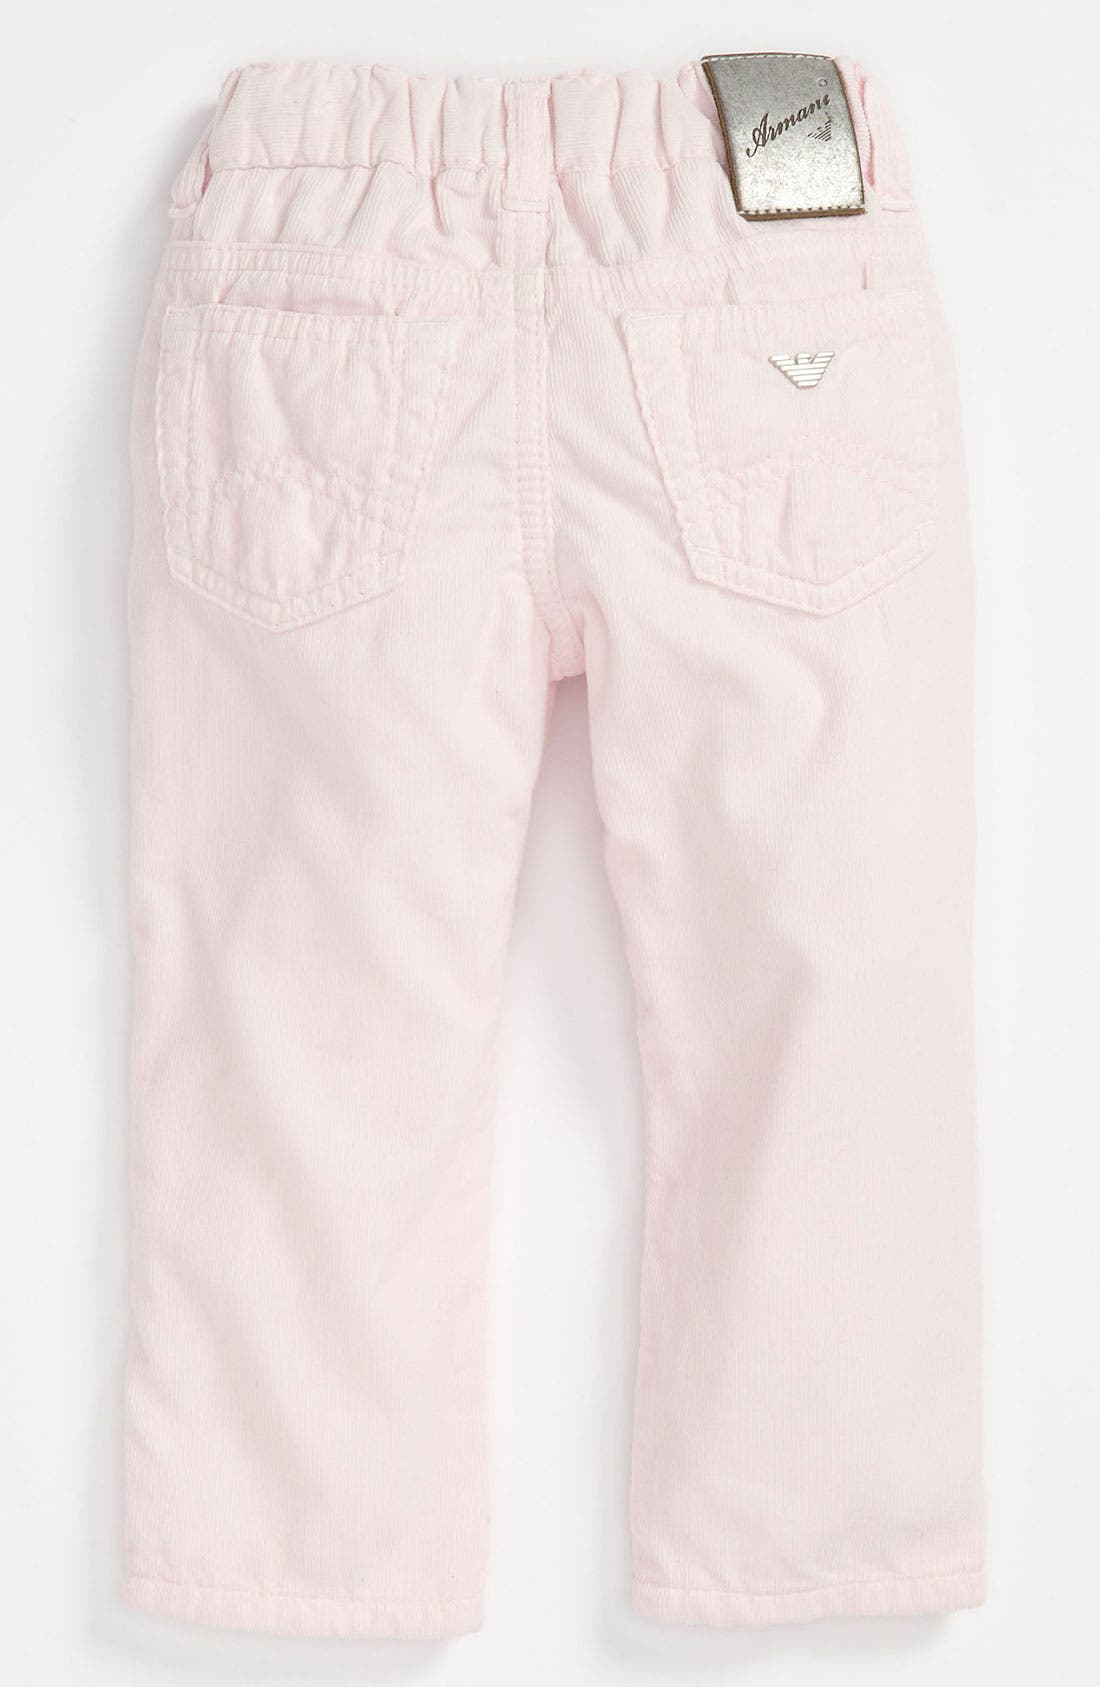 Alternate Image 1 Selected - Armani Junior Corduroy Pants (Infant)